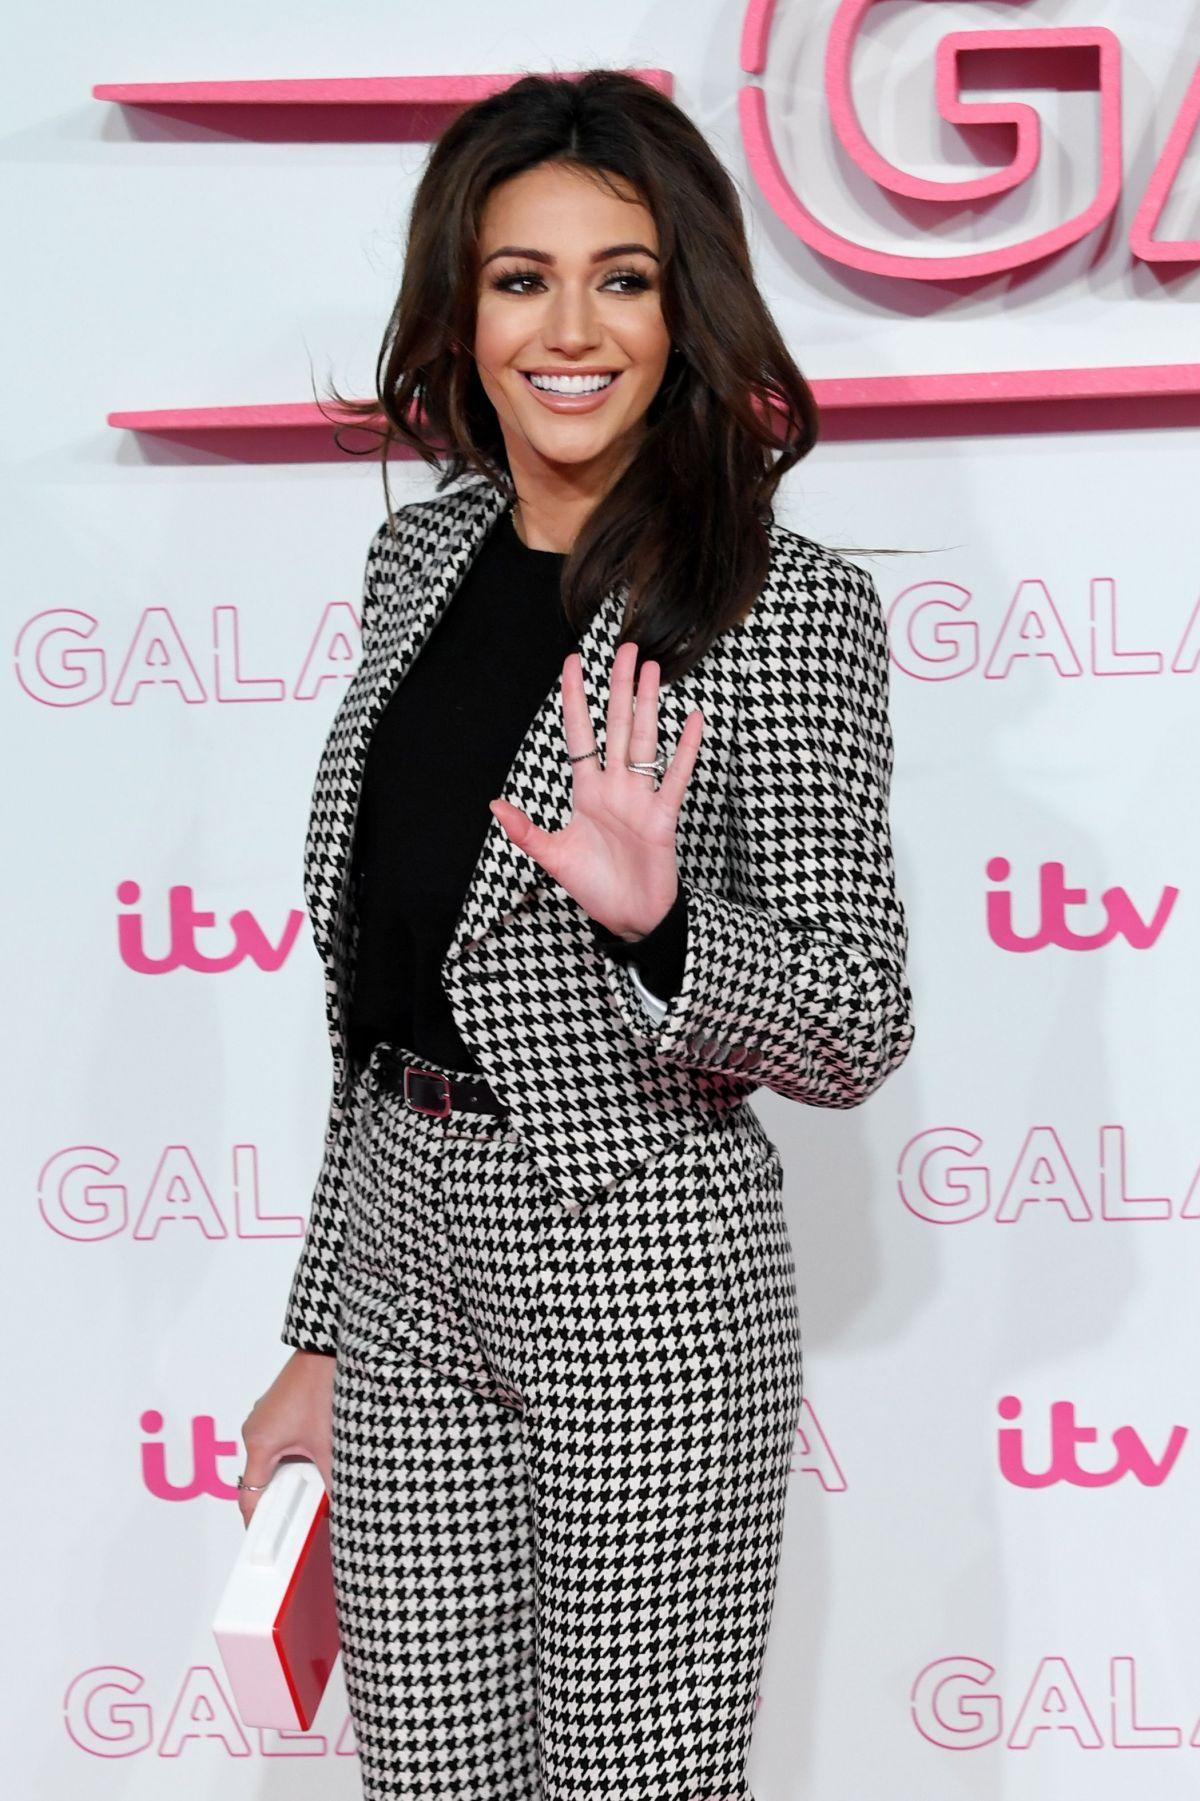 MICHELLE KEEGAN at ITV Gala in London 11/24/2016